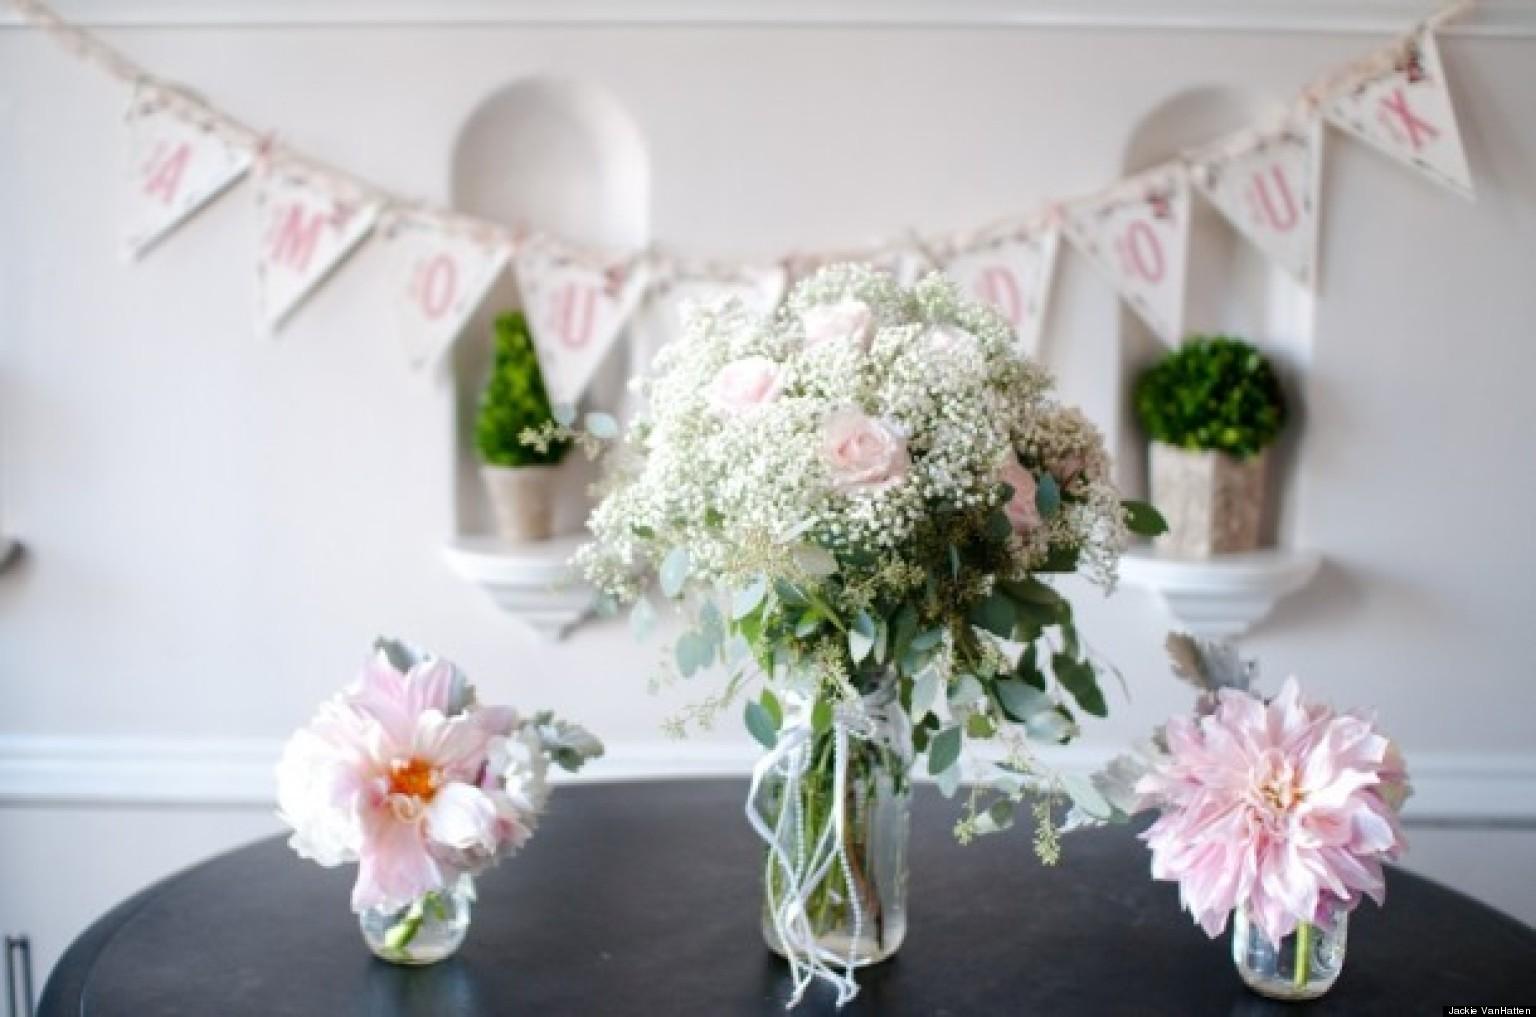 wedding flowers 4 centerpieces for your bridal shower photos. Black Bedroom Furniture Sets. Home Design Ideas